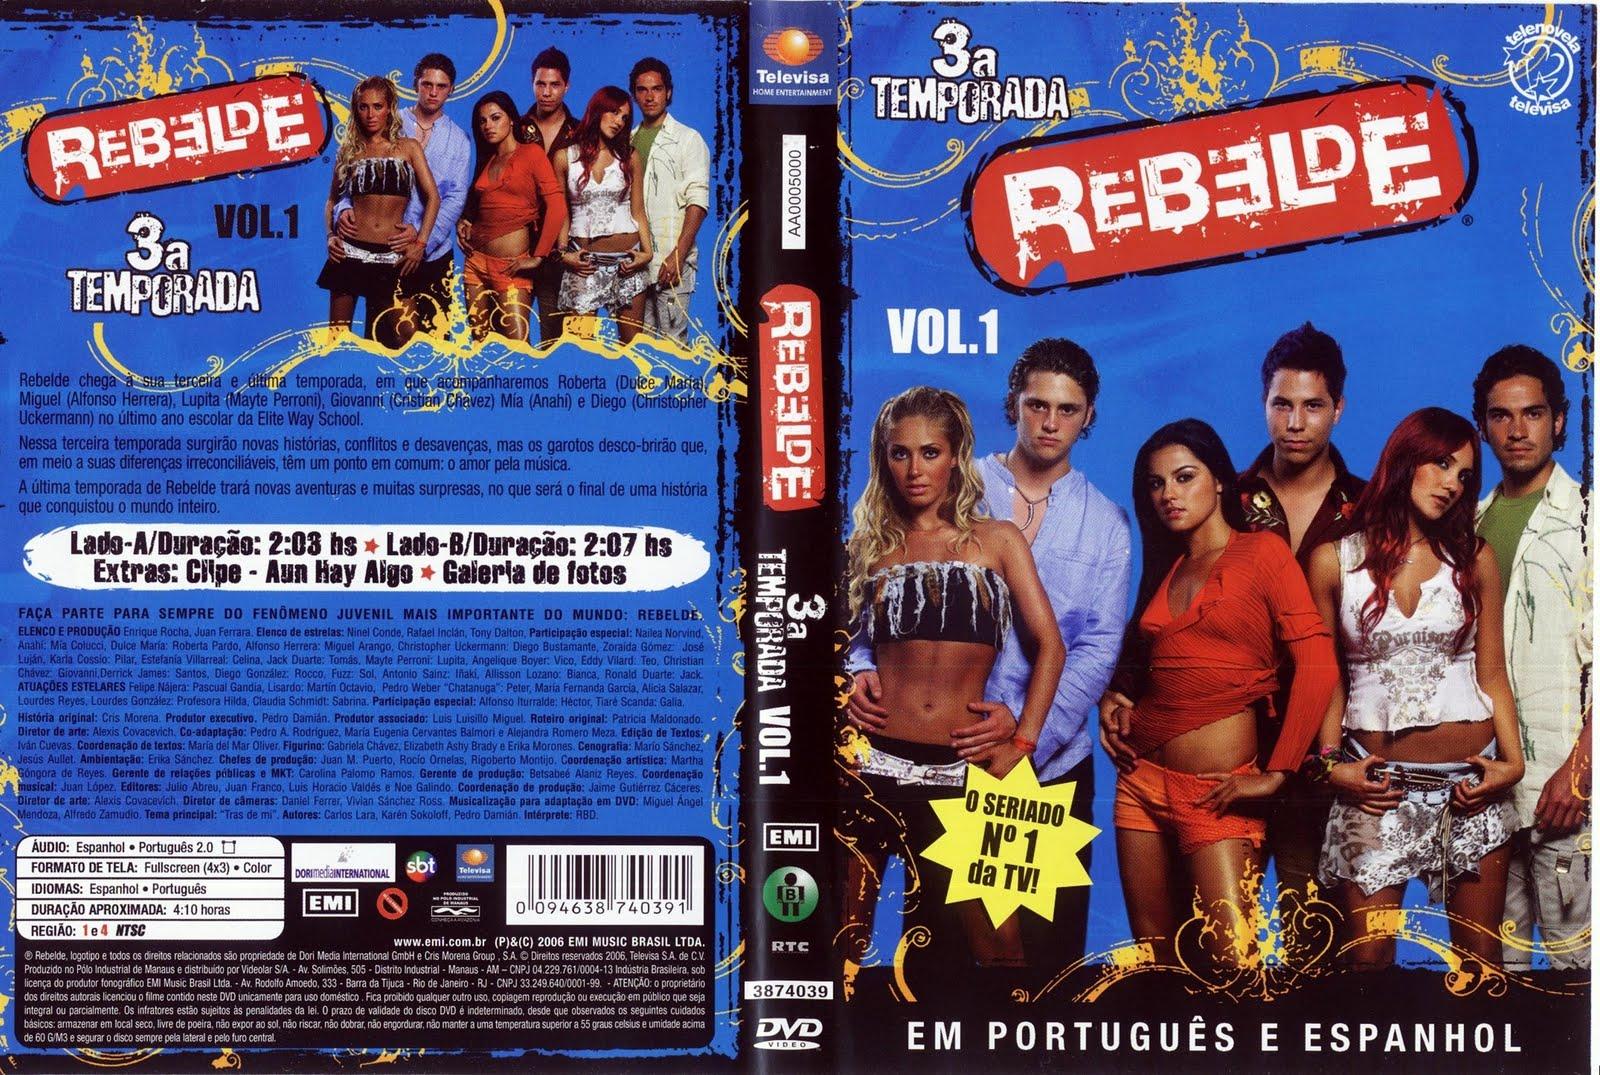 1 temporada rebelde: